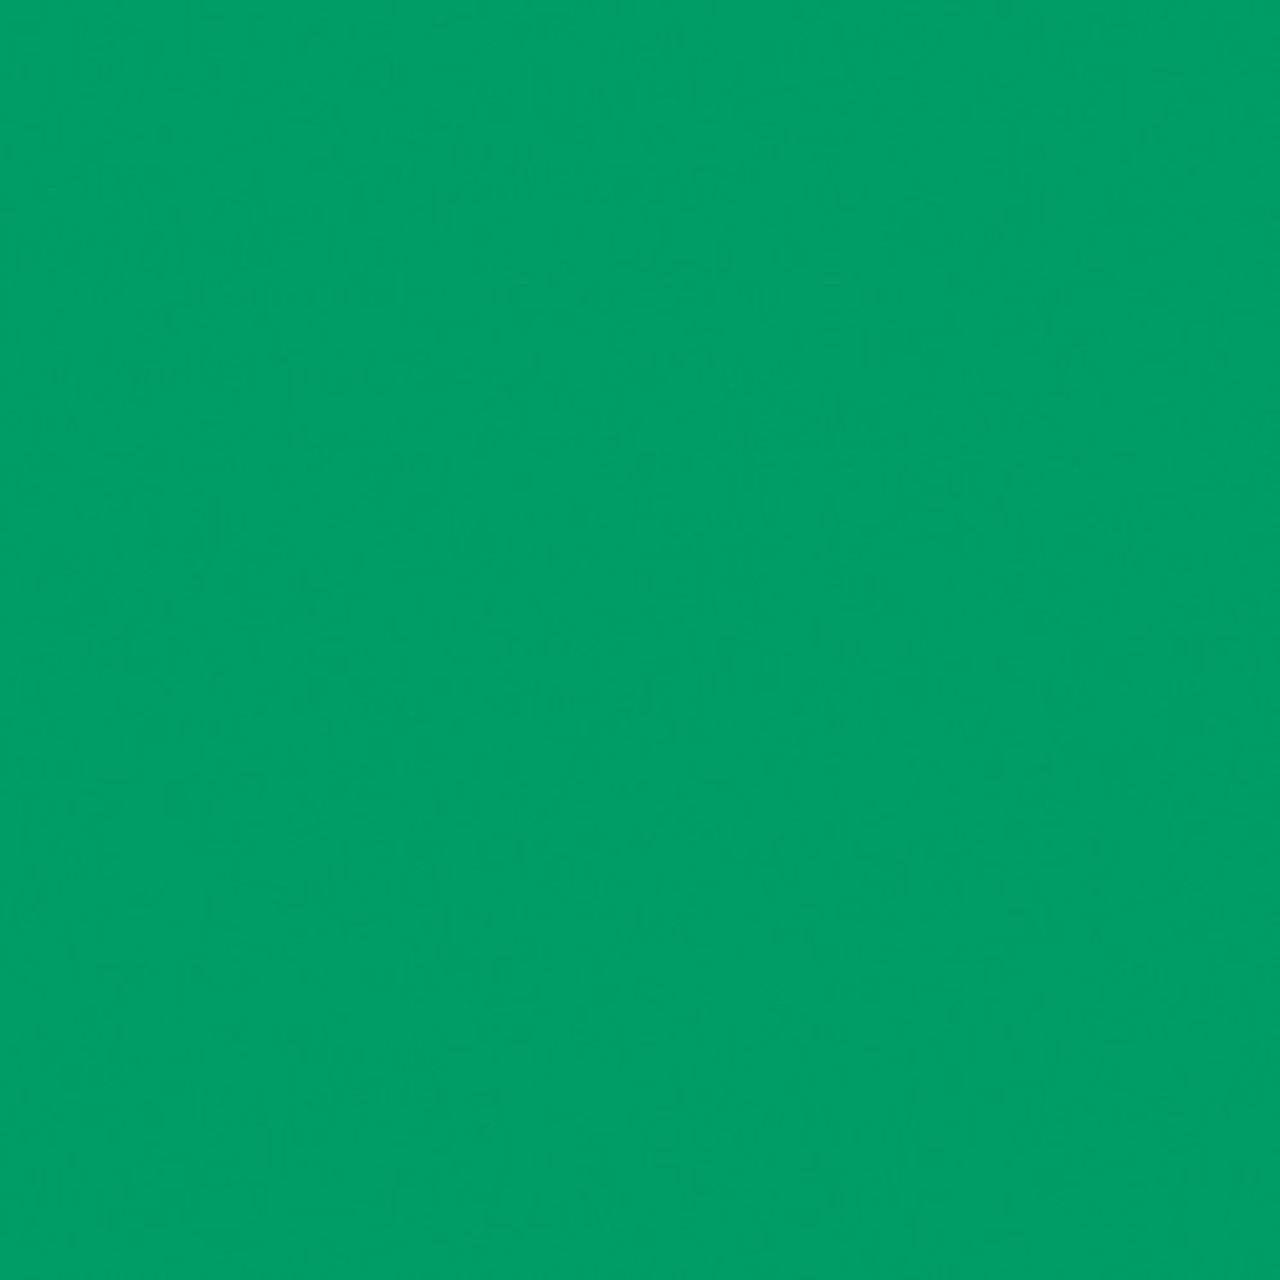 "#0089 Rosco Gels Roscolux Moss Green, 20x24"""